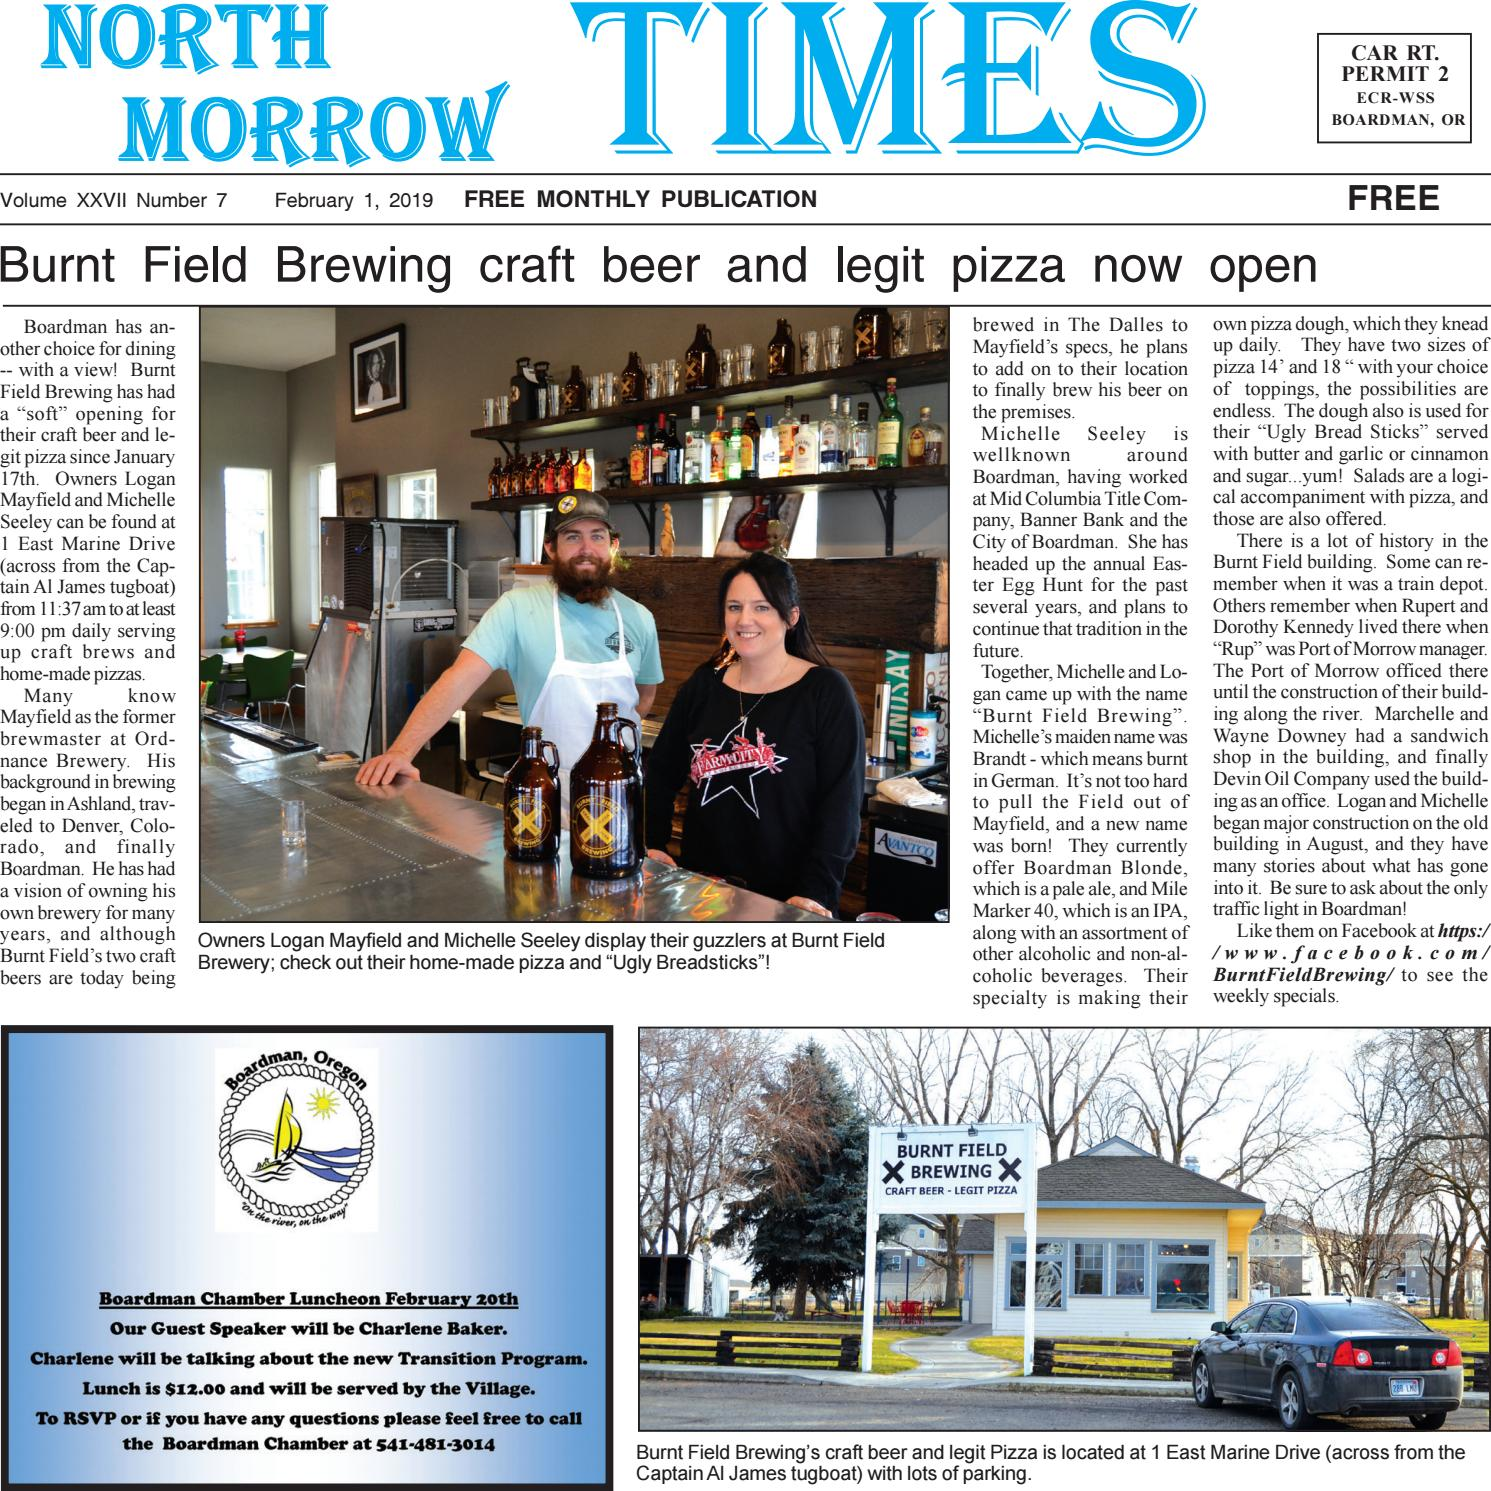 Boardman Calendar February 2019 February, 1, 2019 by North Morrow Times   issuu